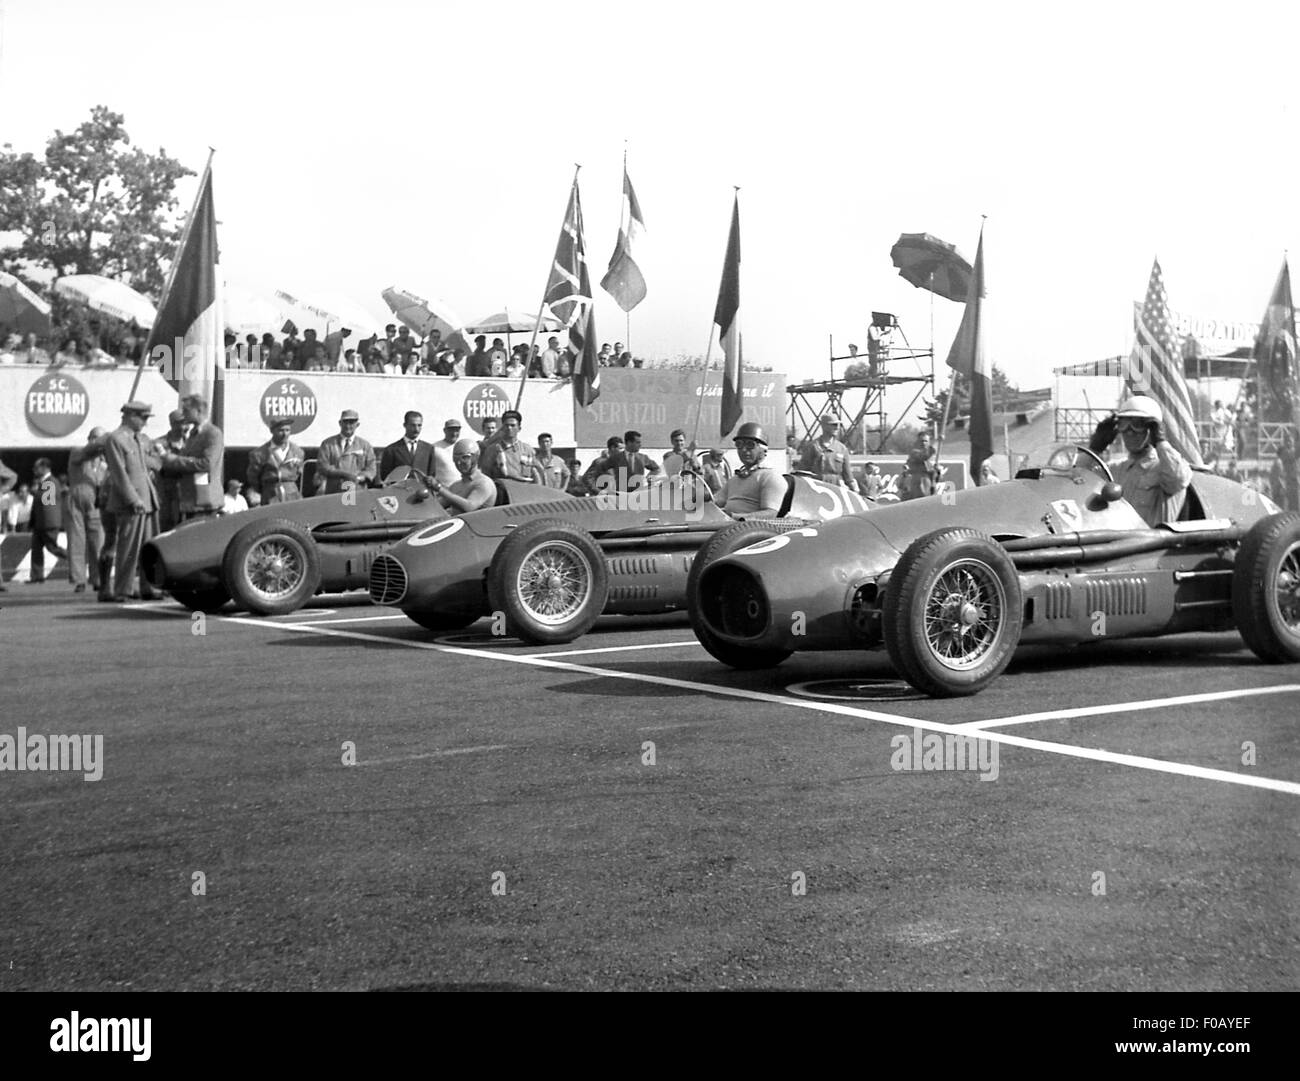 Italian GP in Monza 1956 - Stock Image